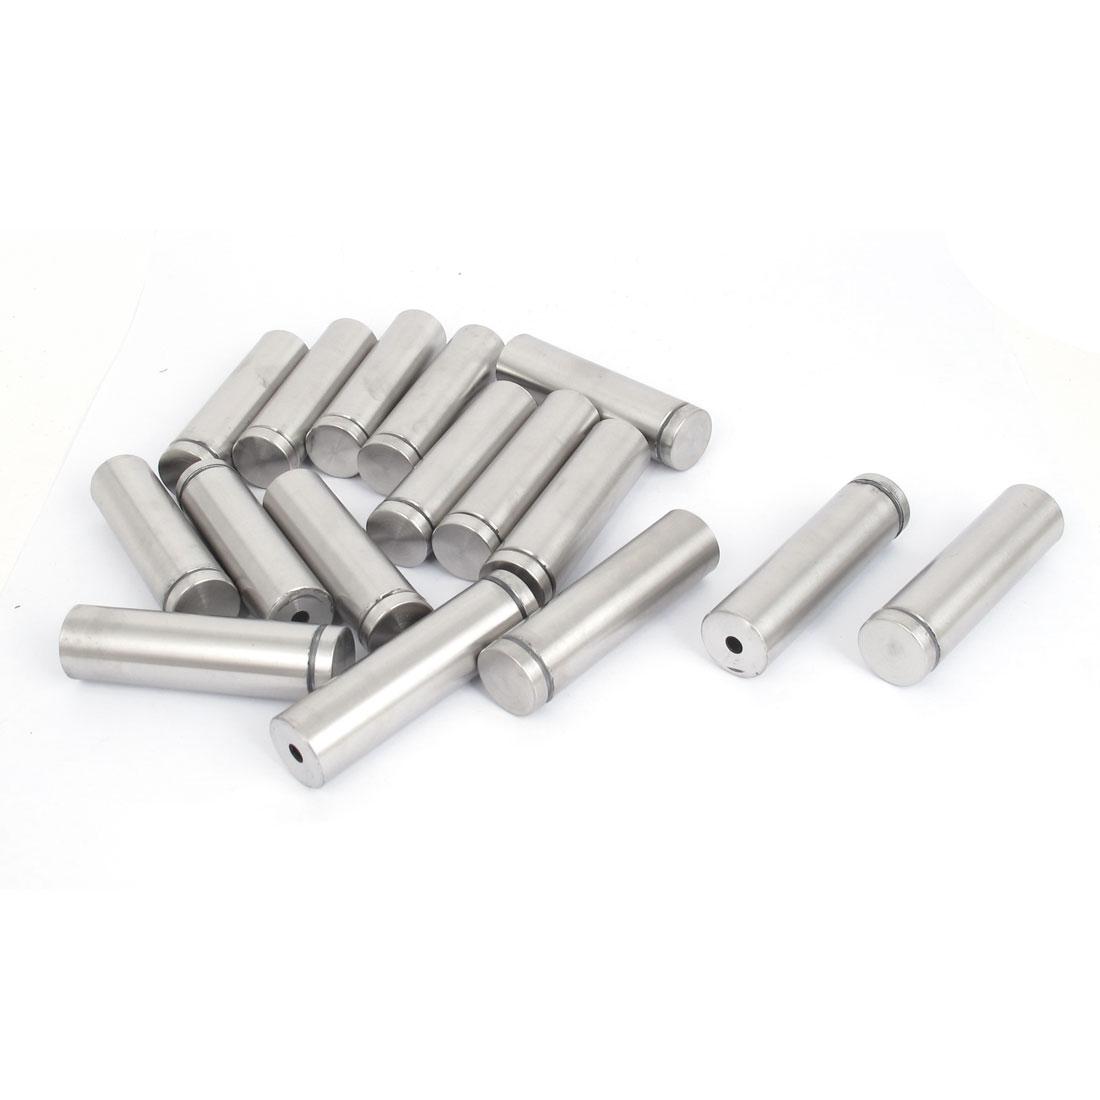 19mm x 70mm Stainless Steel Advertising Frameless Glass Standoff Pins 16pcs